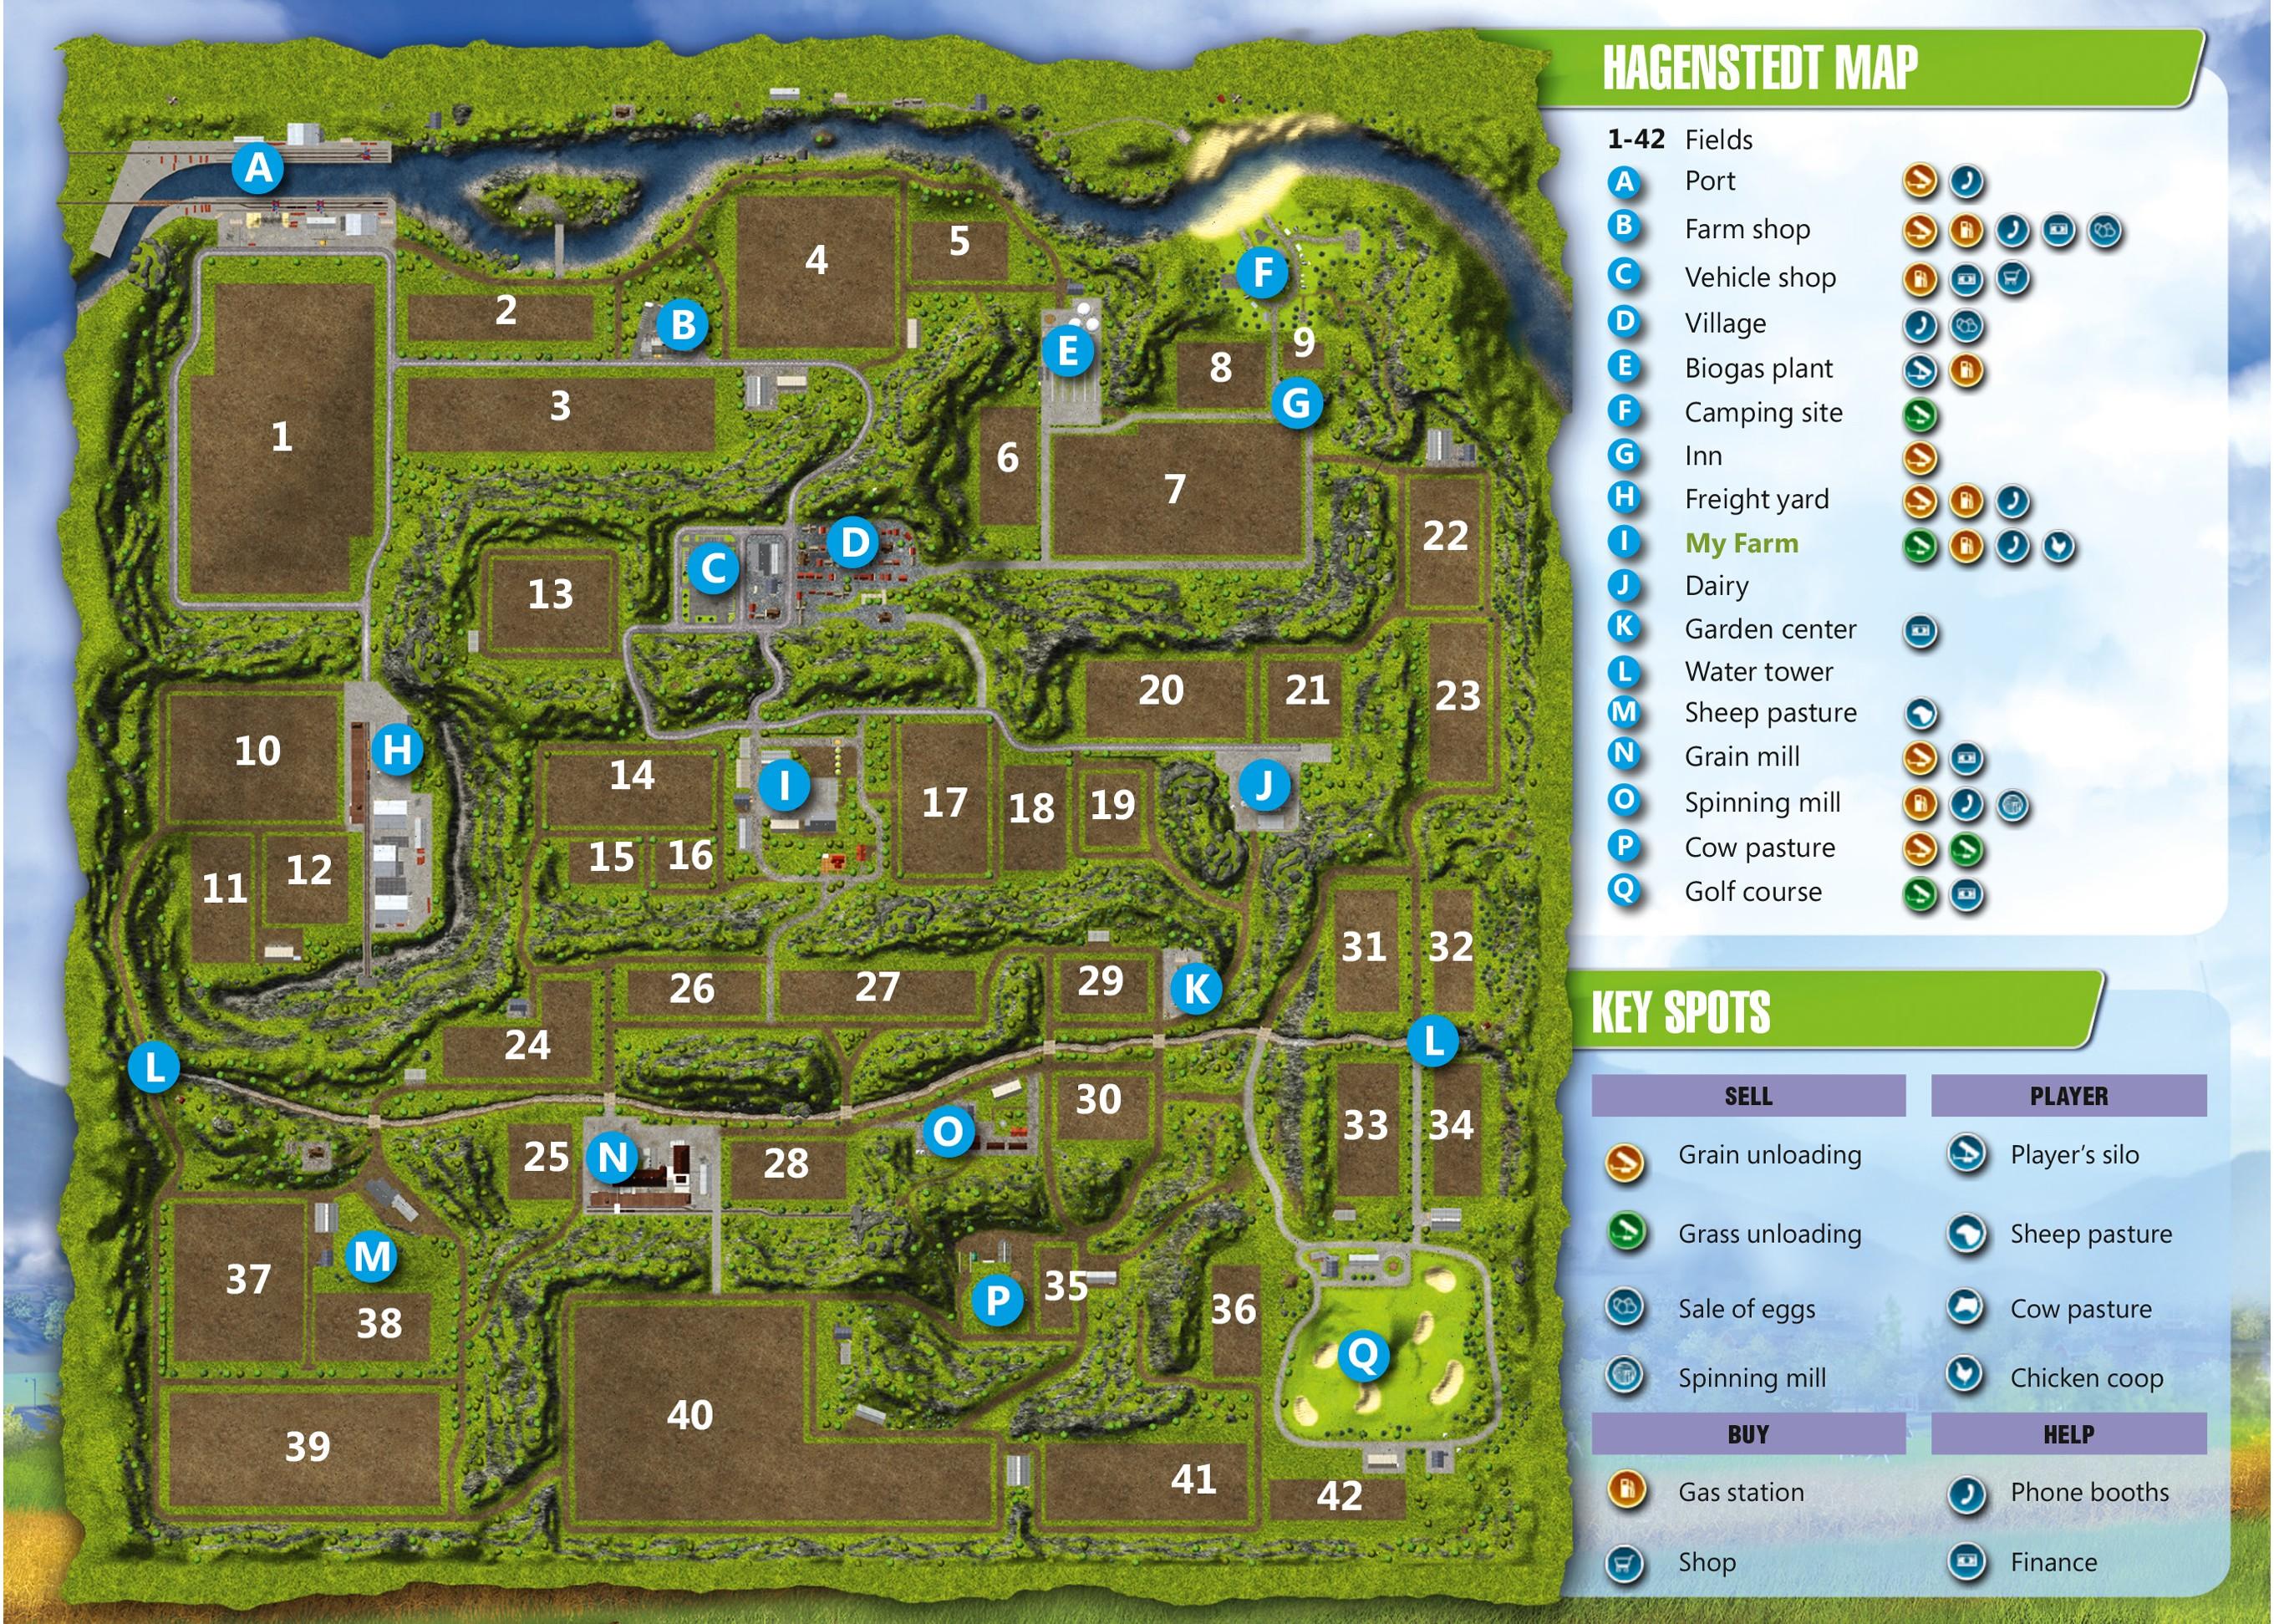 Map Usa Farming Simulator 2013%0A FS EN Map Hagenstedt HD